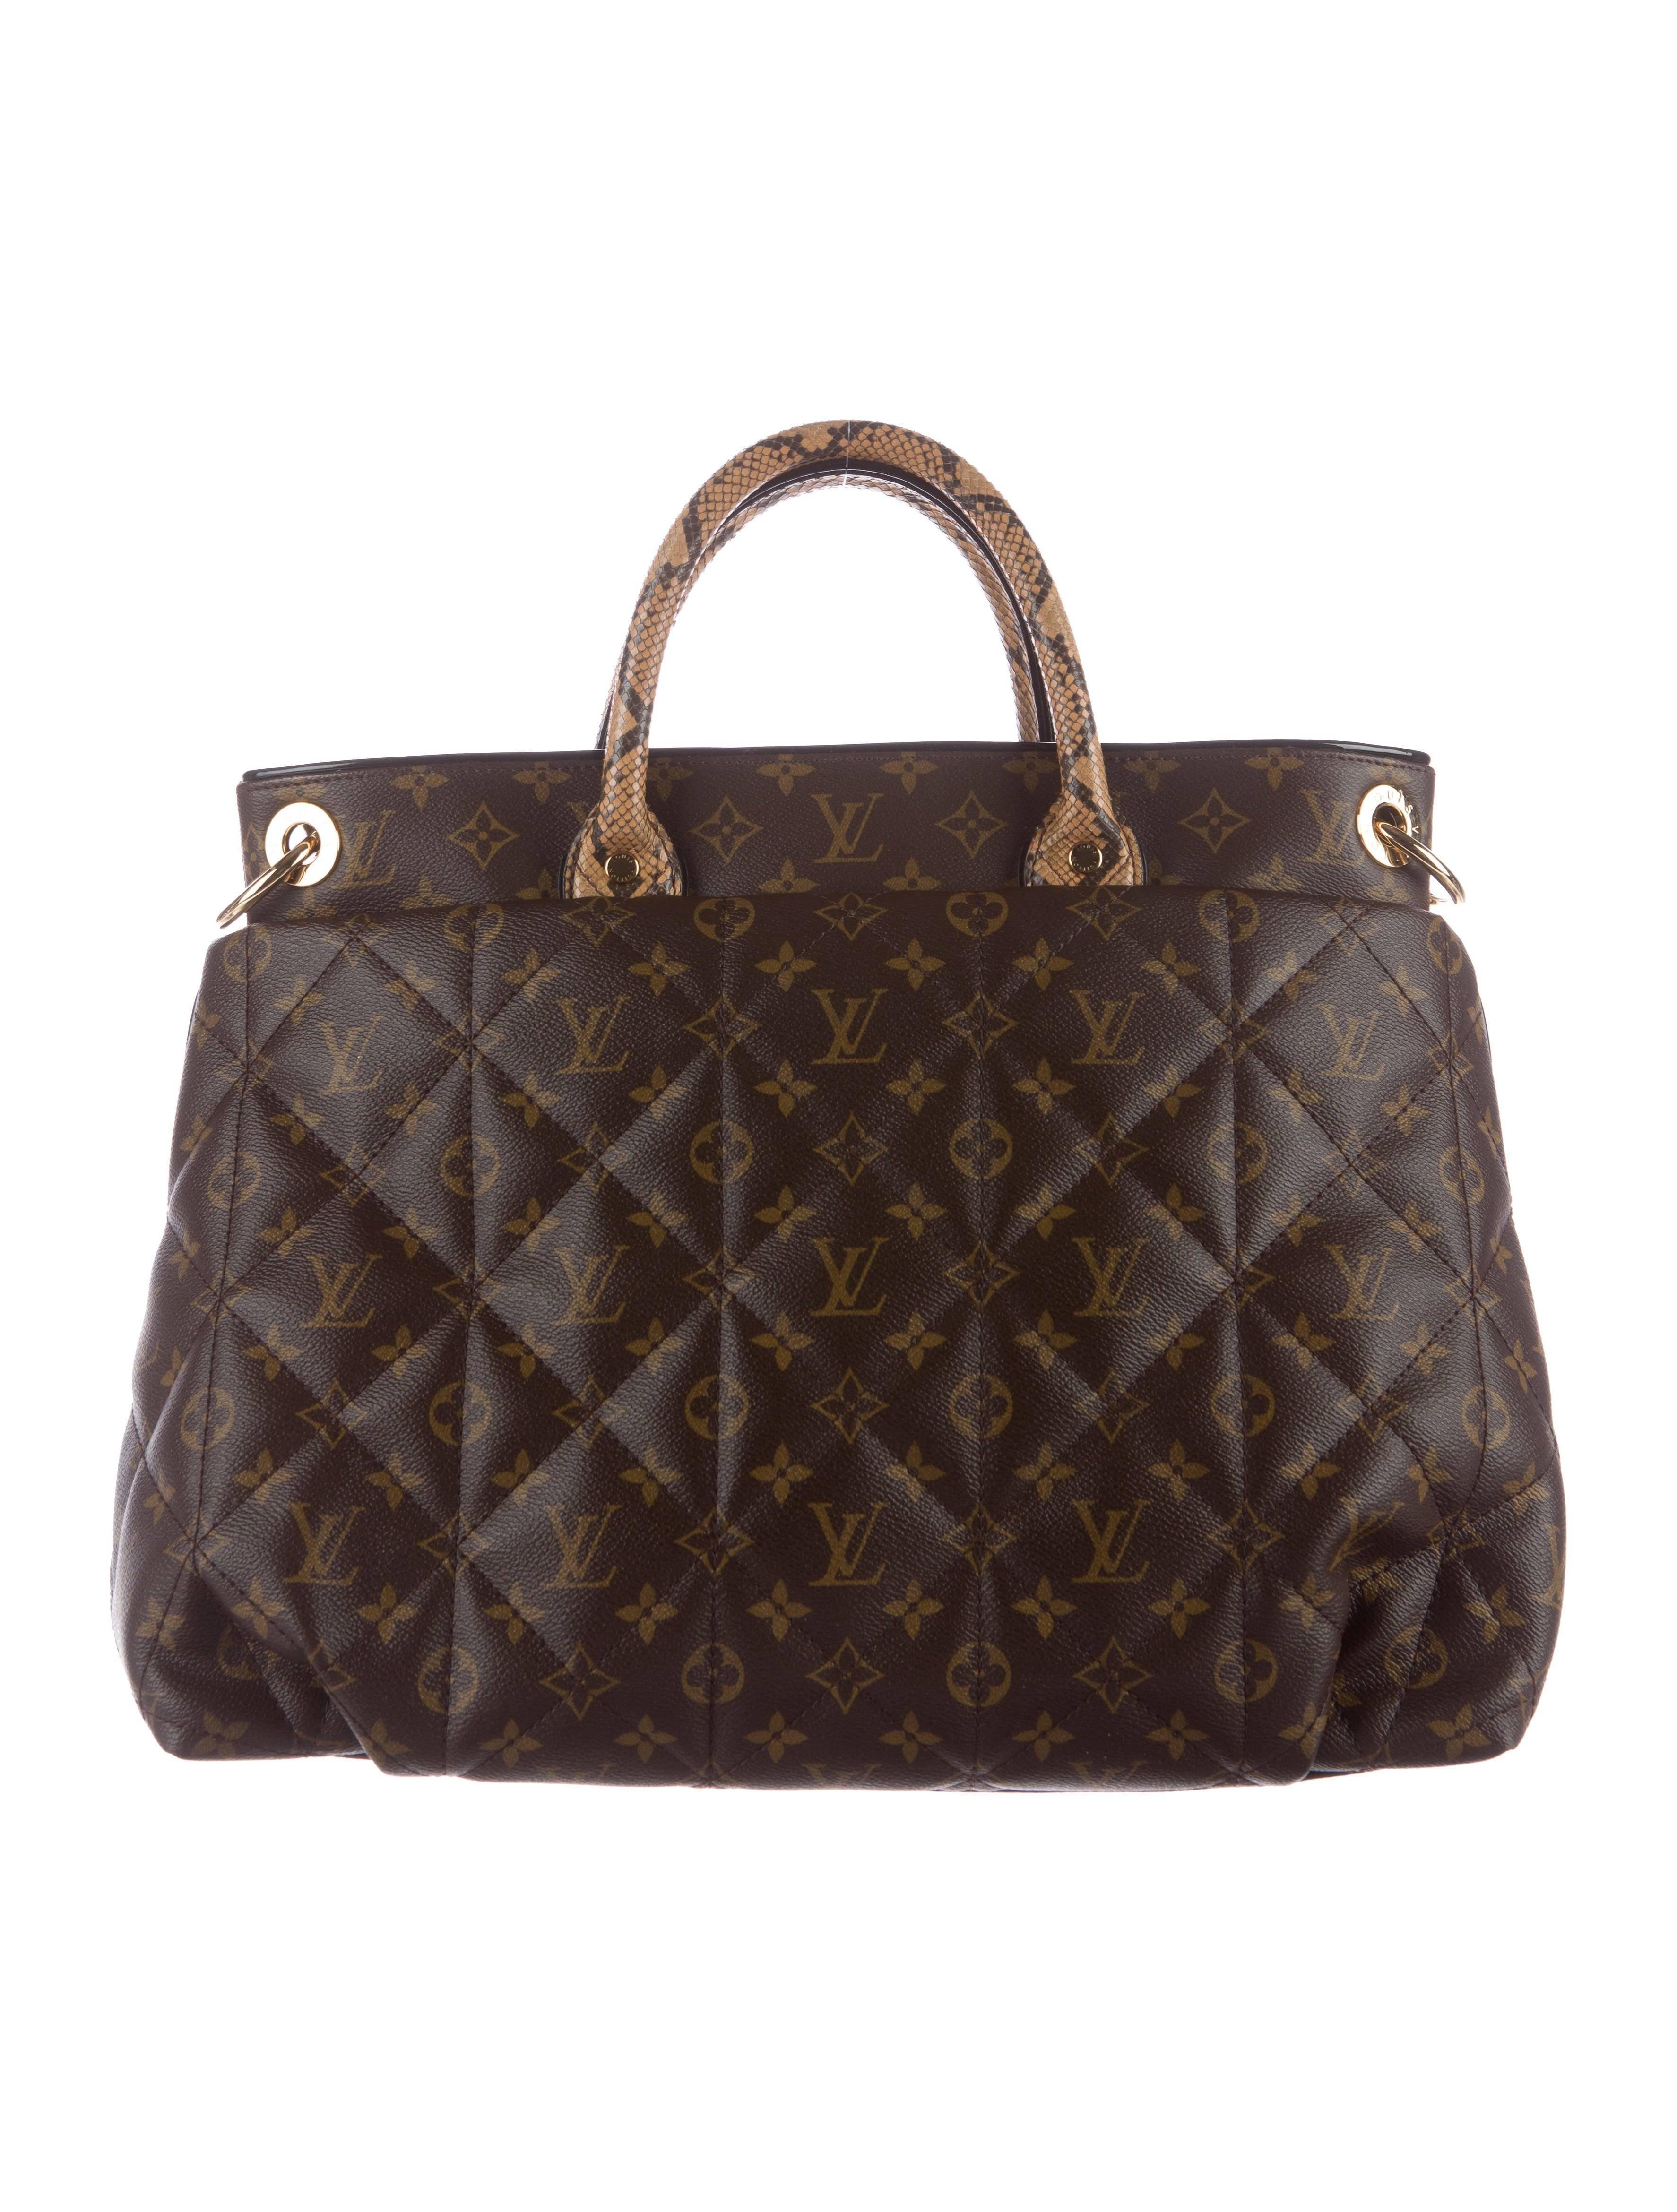 4e4b243b2261 Louis Vuitton Monogram Python Large Men s Carryall Top Handle Tote Shoulder  Bag For Sale at 1stdibs